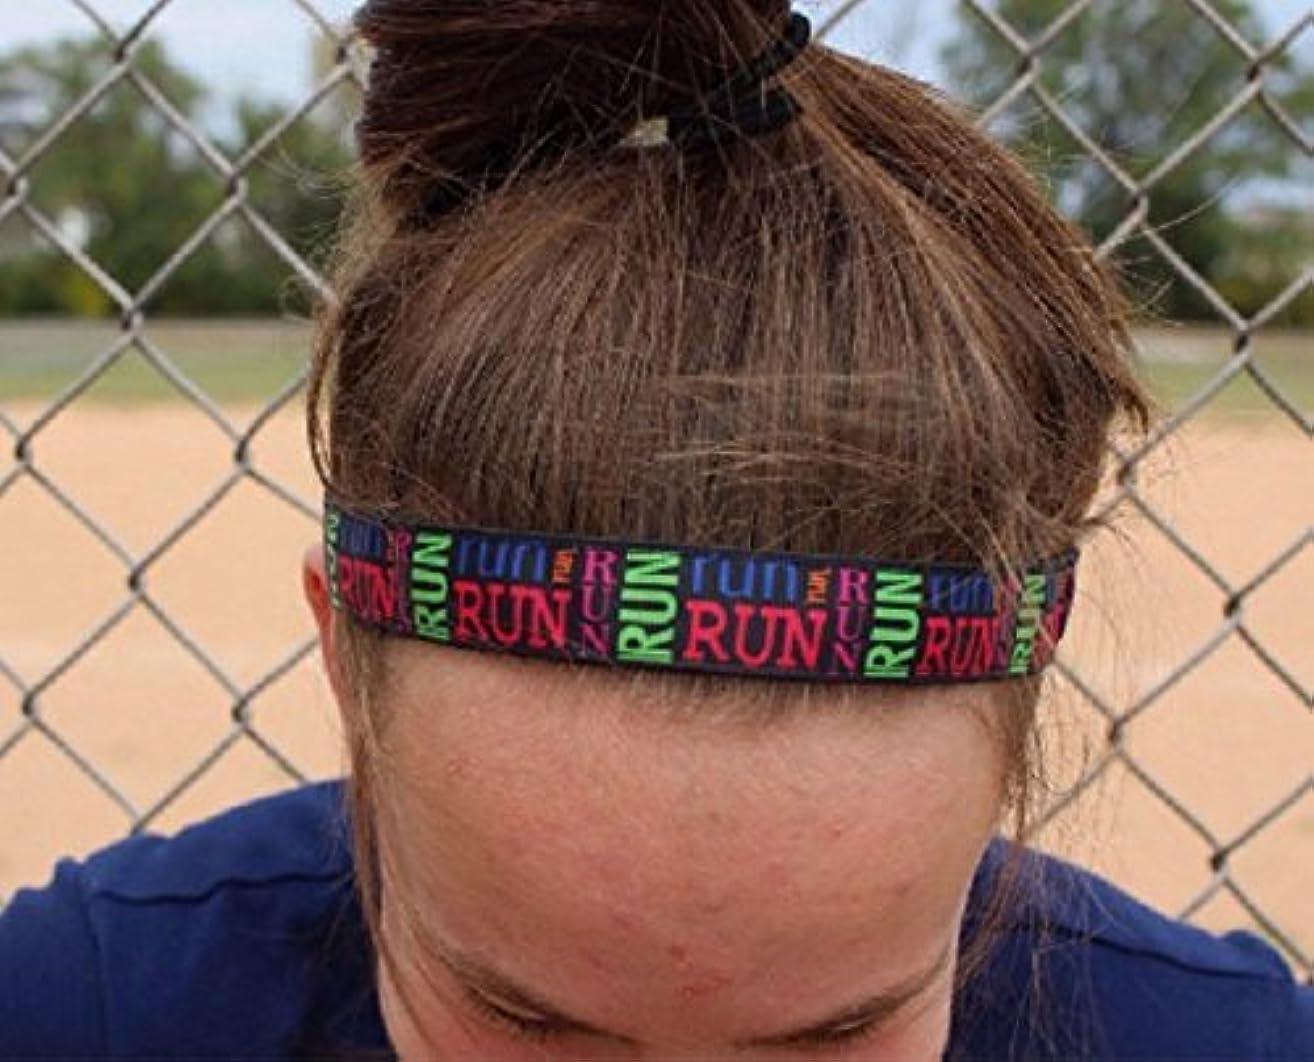 Nonslip Running Headbands, Choice of Sizes, RUN, Headbands for Running Women